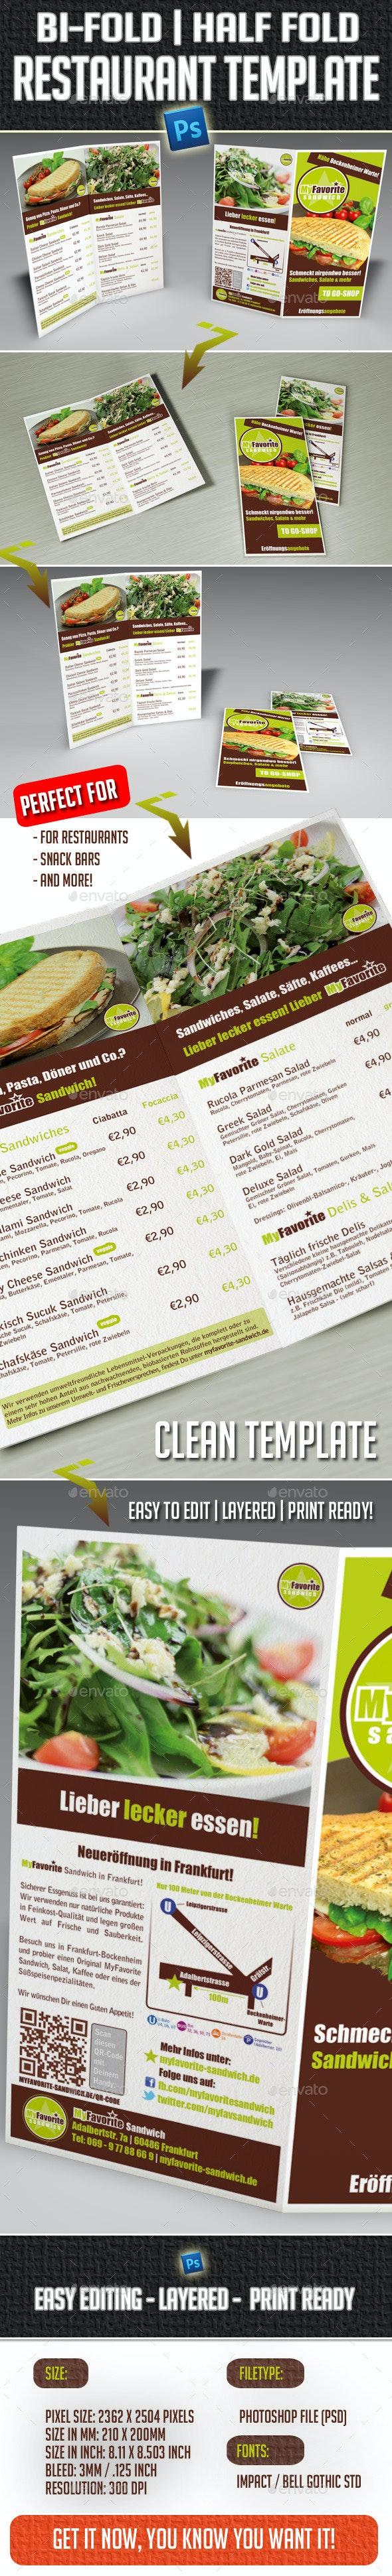 Restaurant Bi-Fold Half-fold Brochure Template - Brochures Print Templates